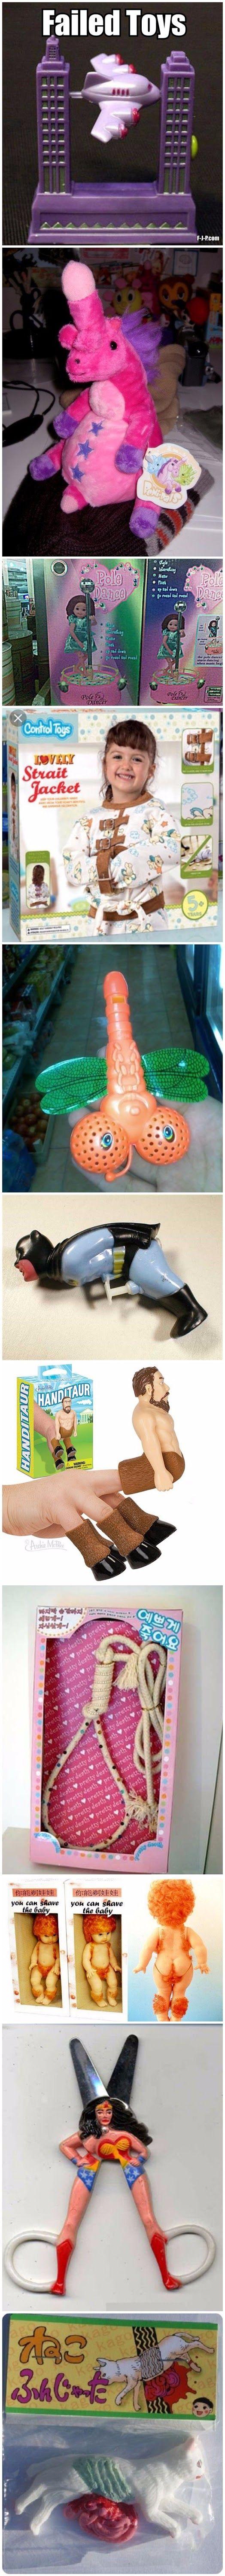 Funny Failed Toys